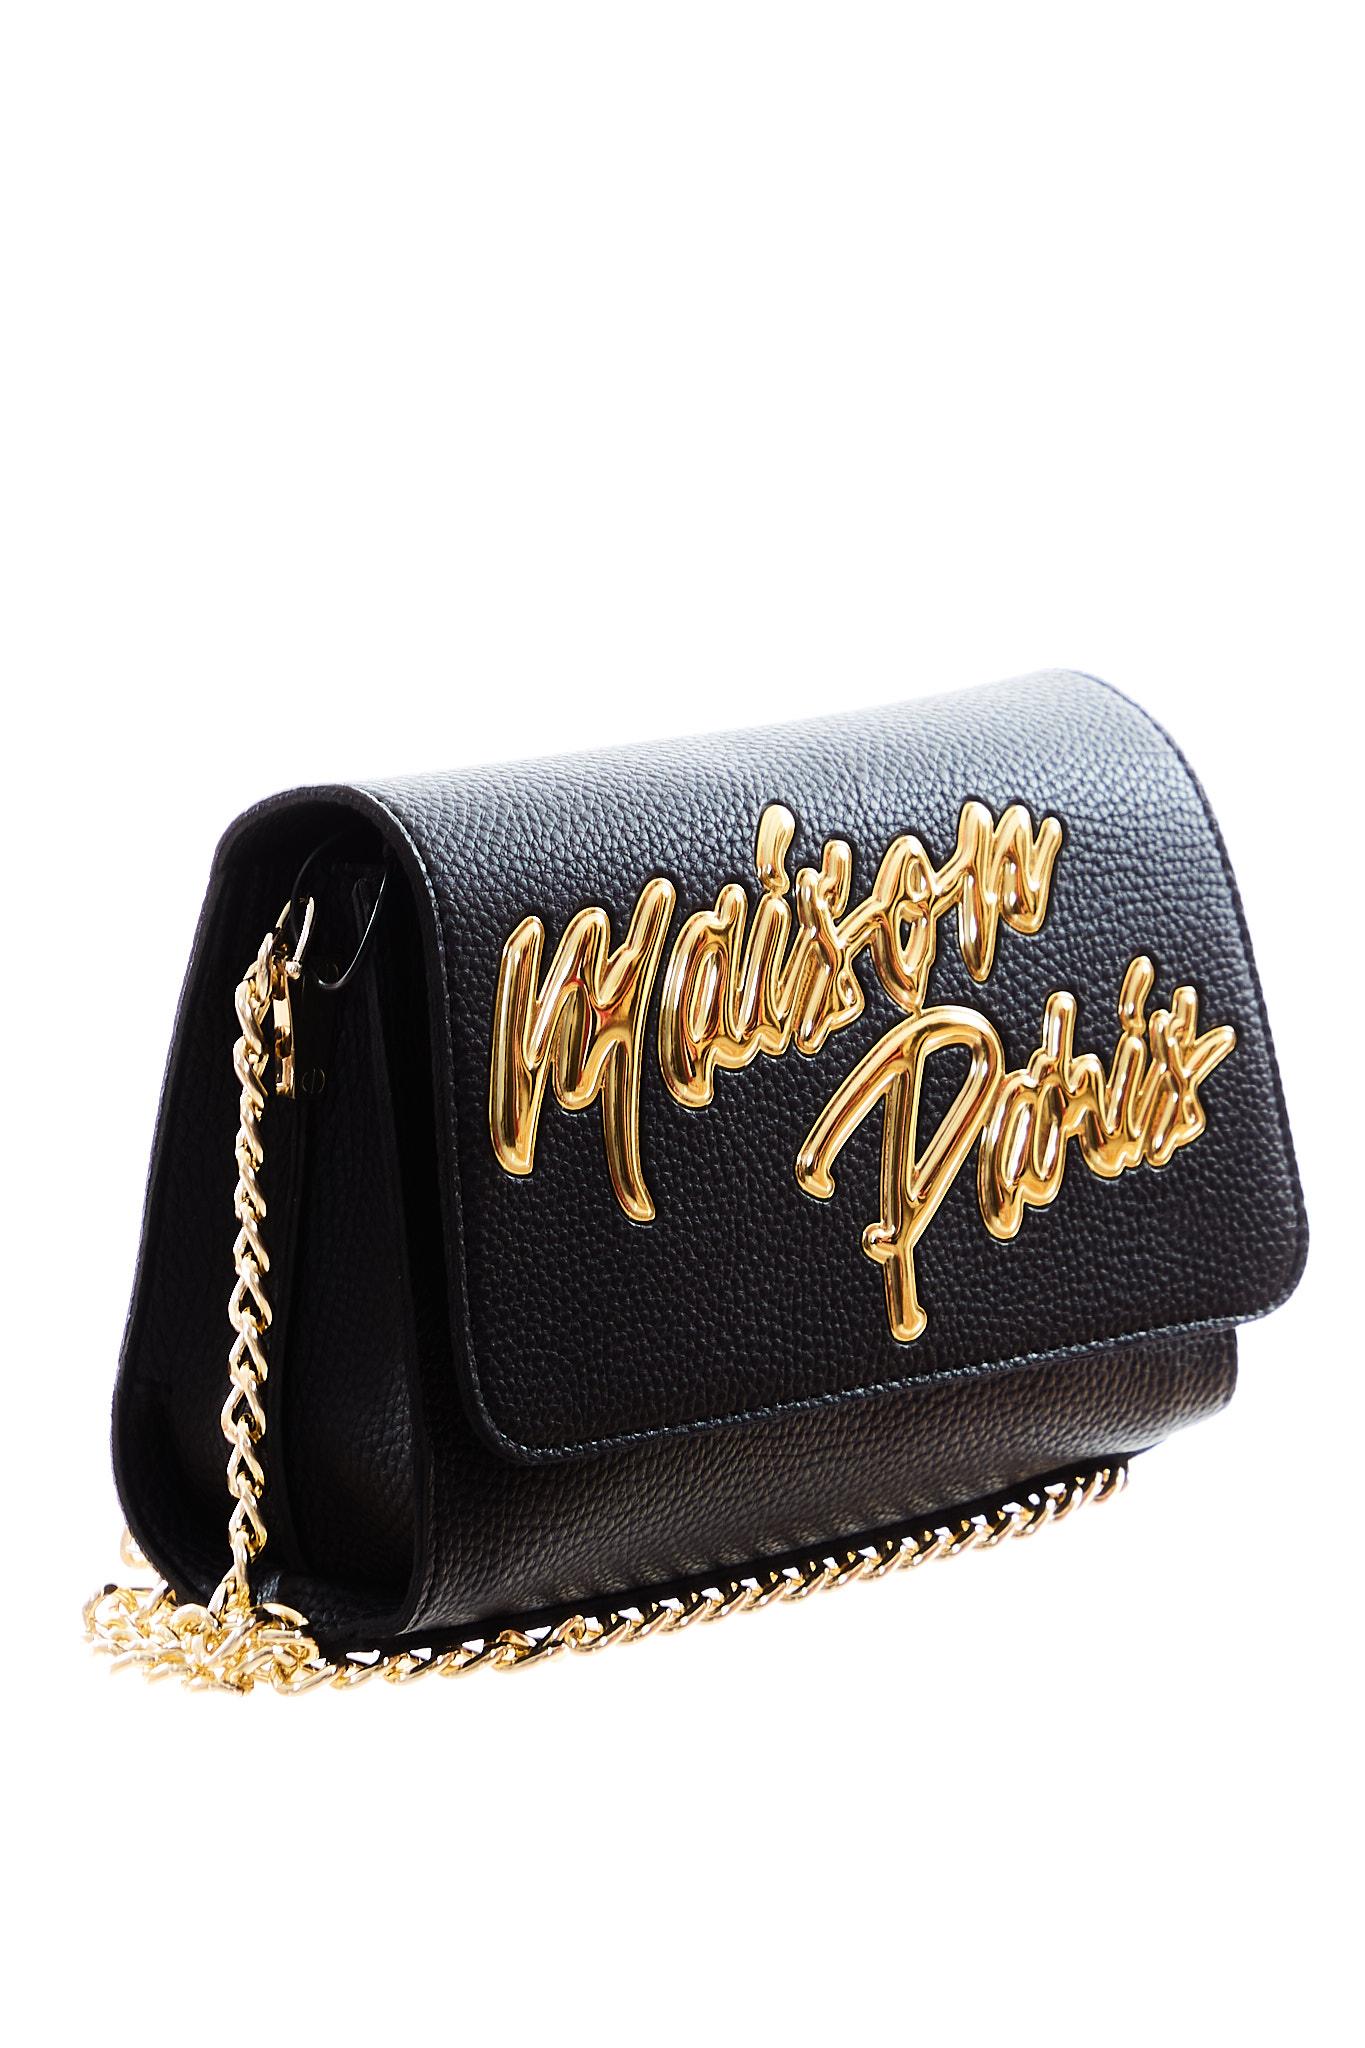 Pochette Marva Maison 9 Paris MAISON 9 PARIS   Pochette   MARVABLACK/GOLD